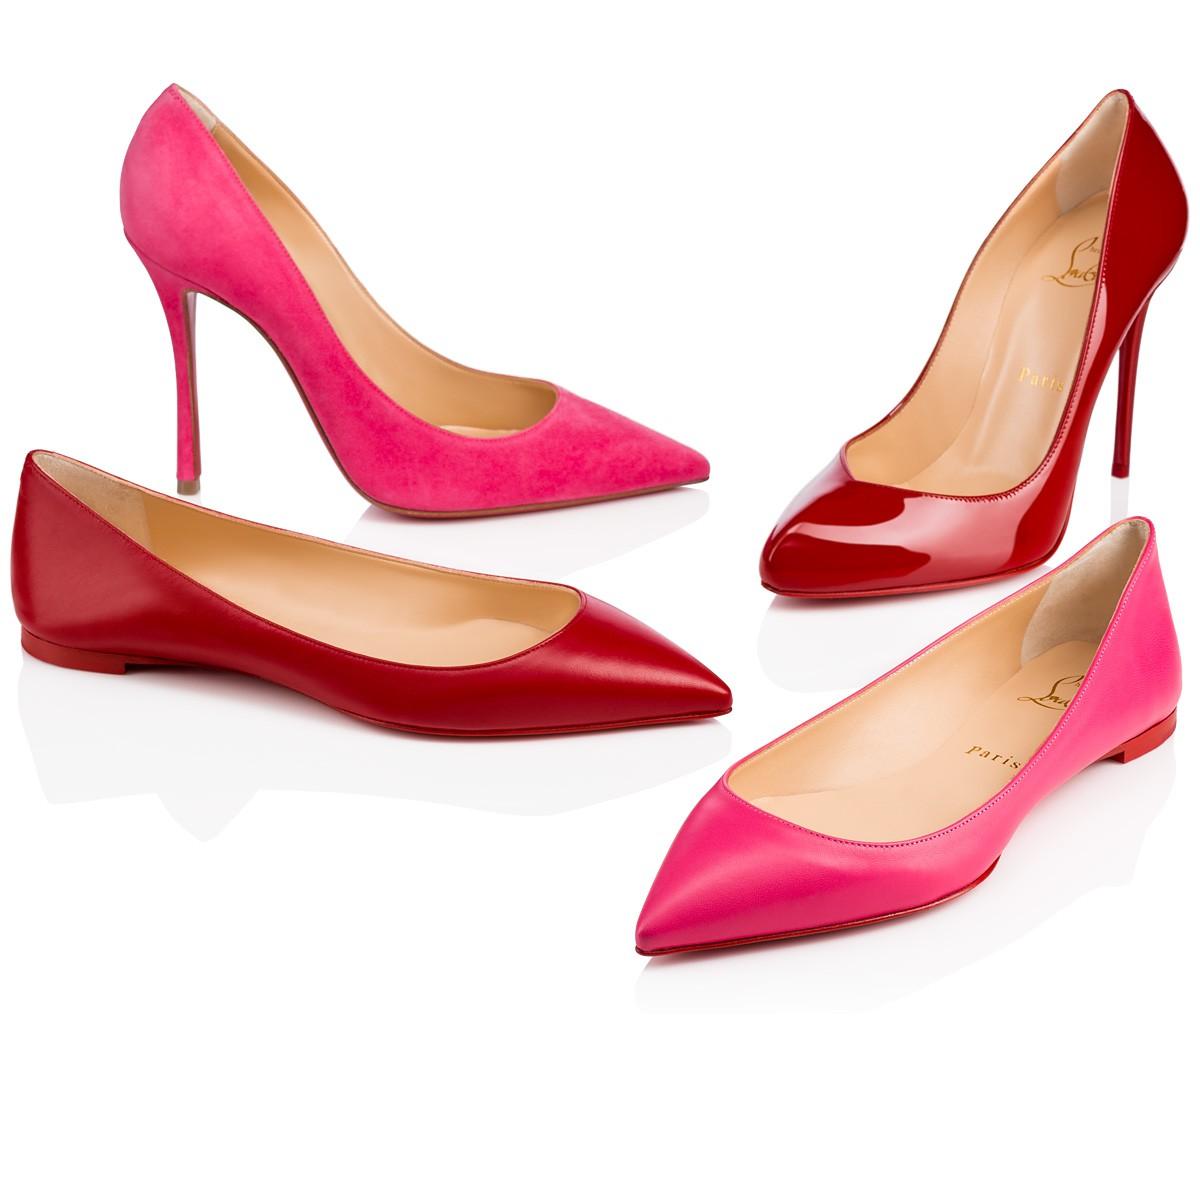 Women Shoes - Decoltish - Christian Louboutin